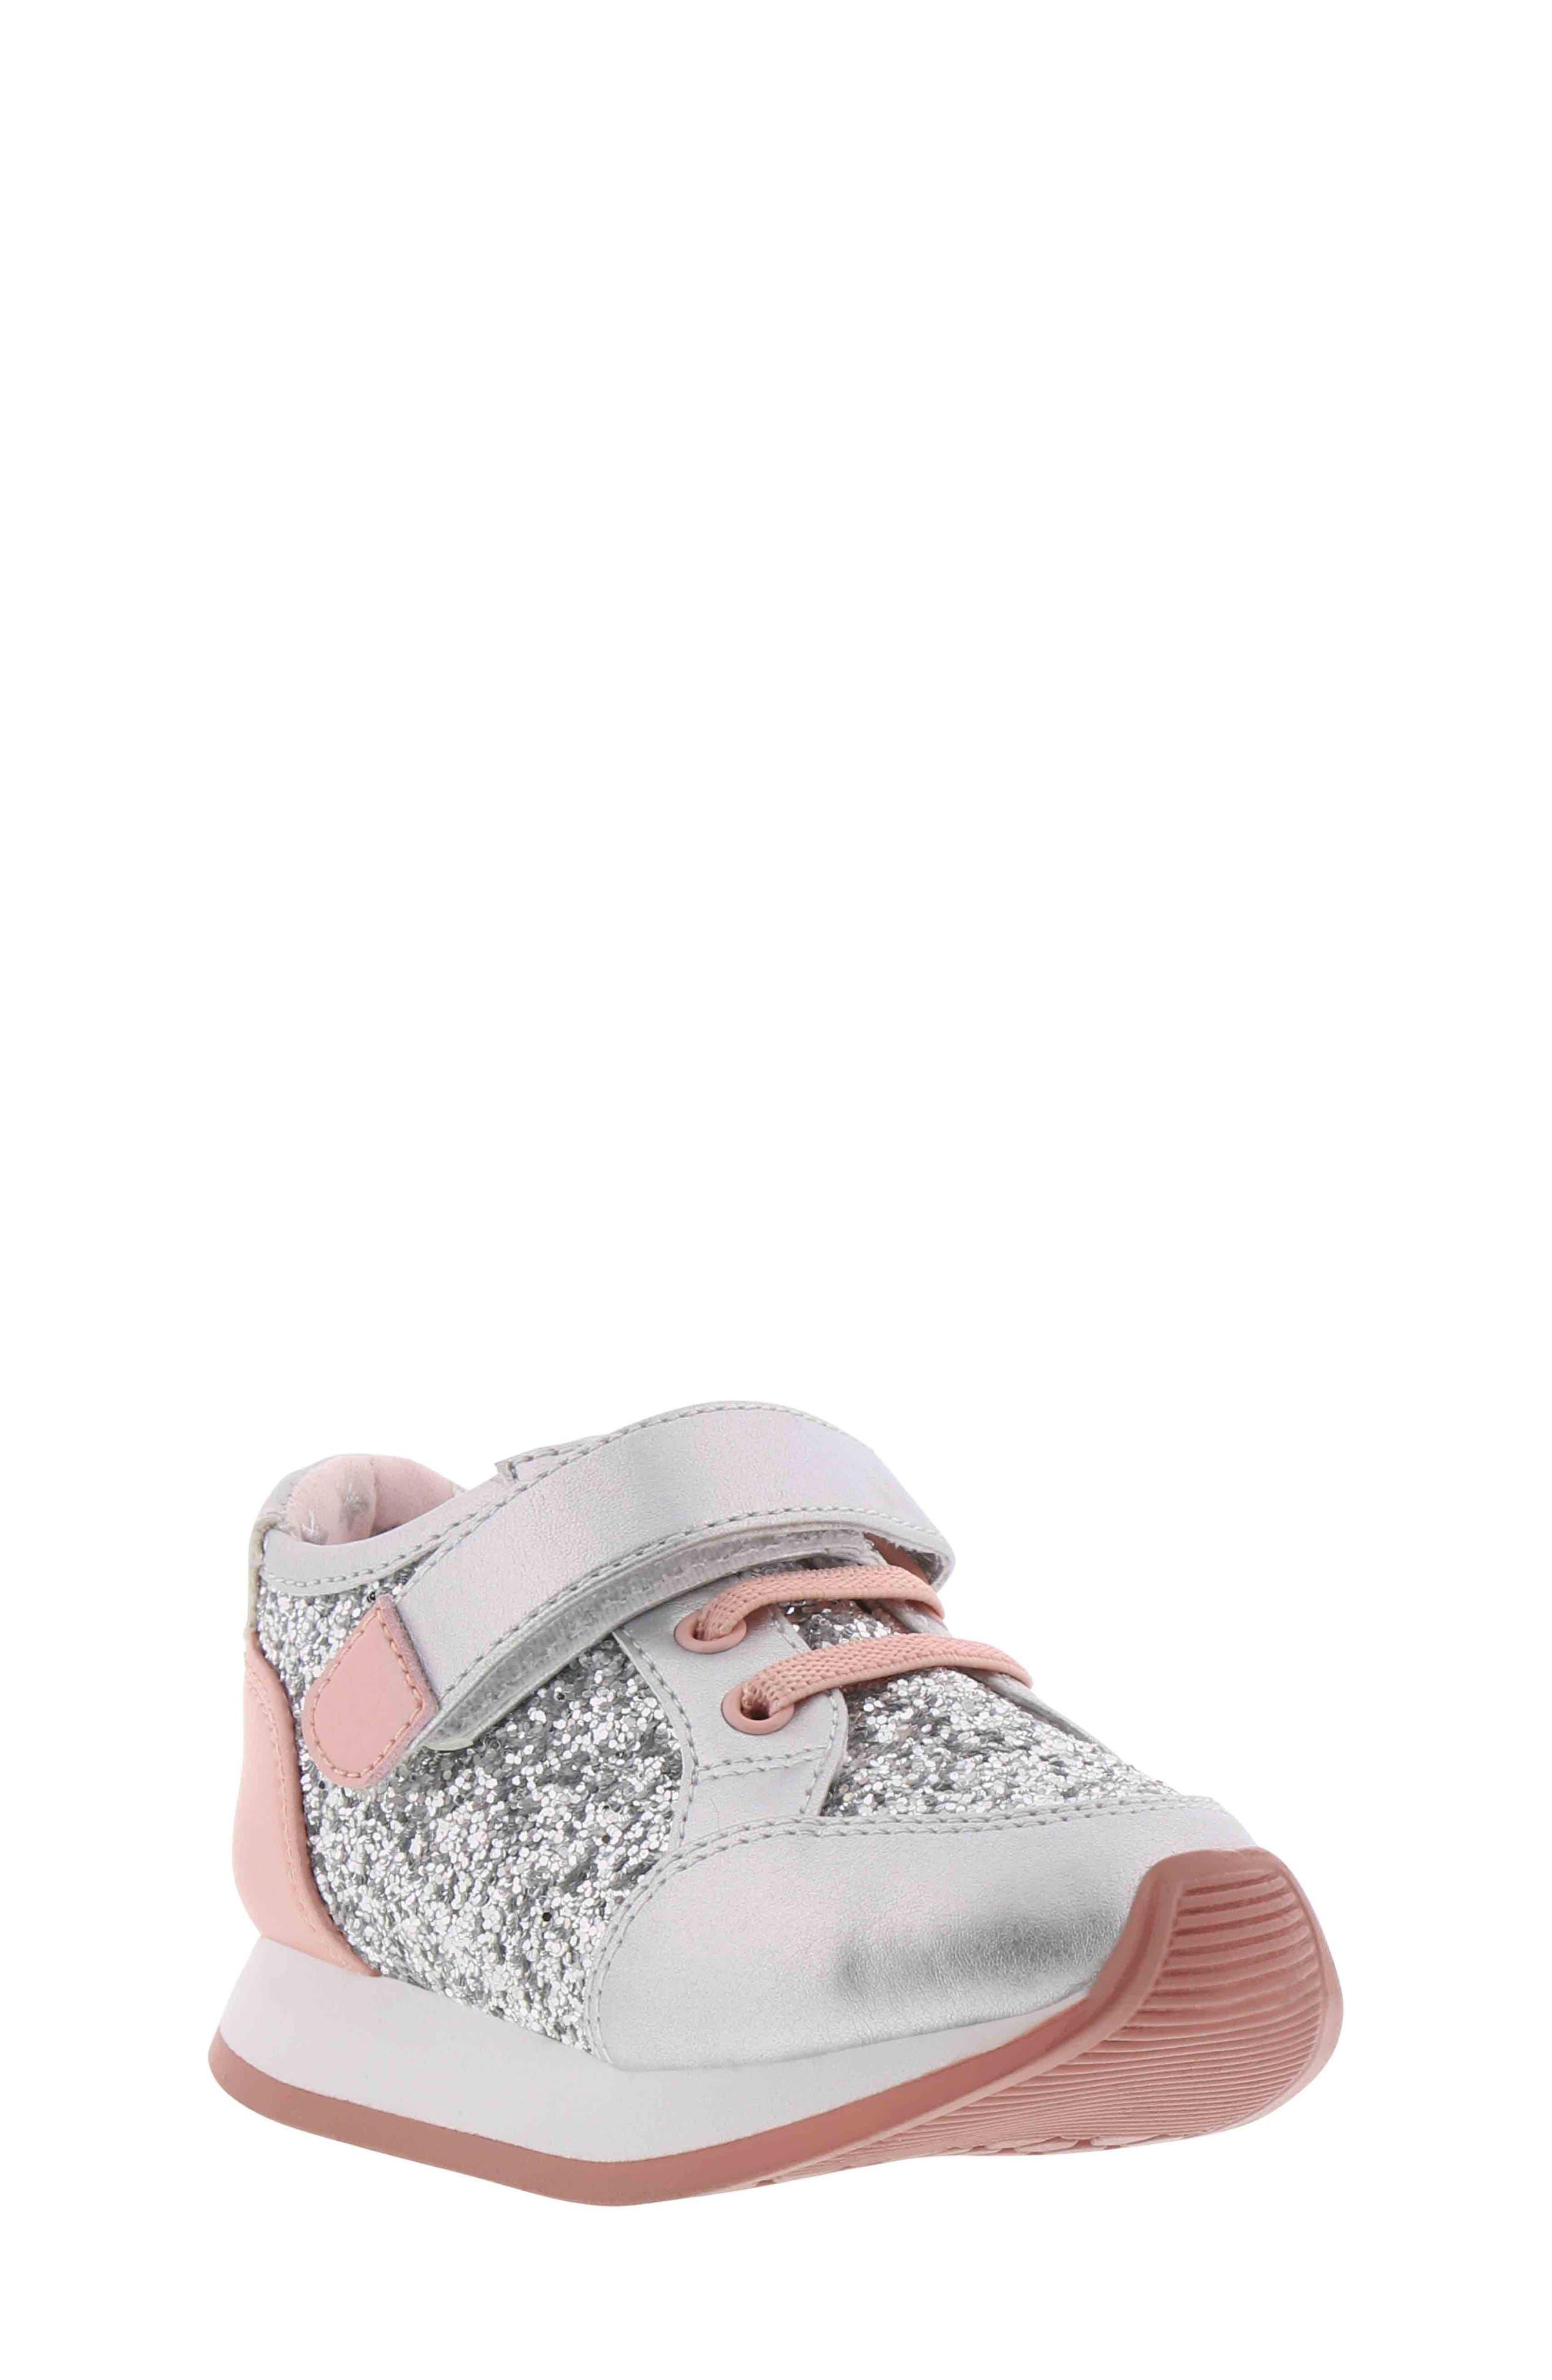 BØRN Adyson Margyne Sparkle Sneaker, Main, color, SILVER PINK